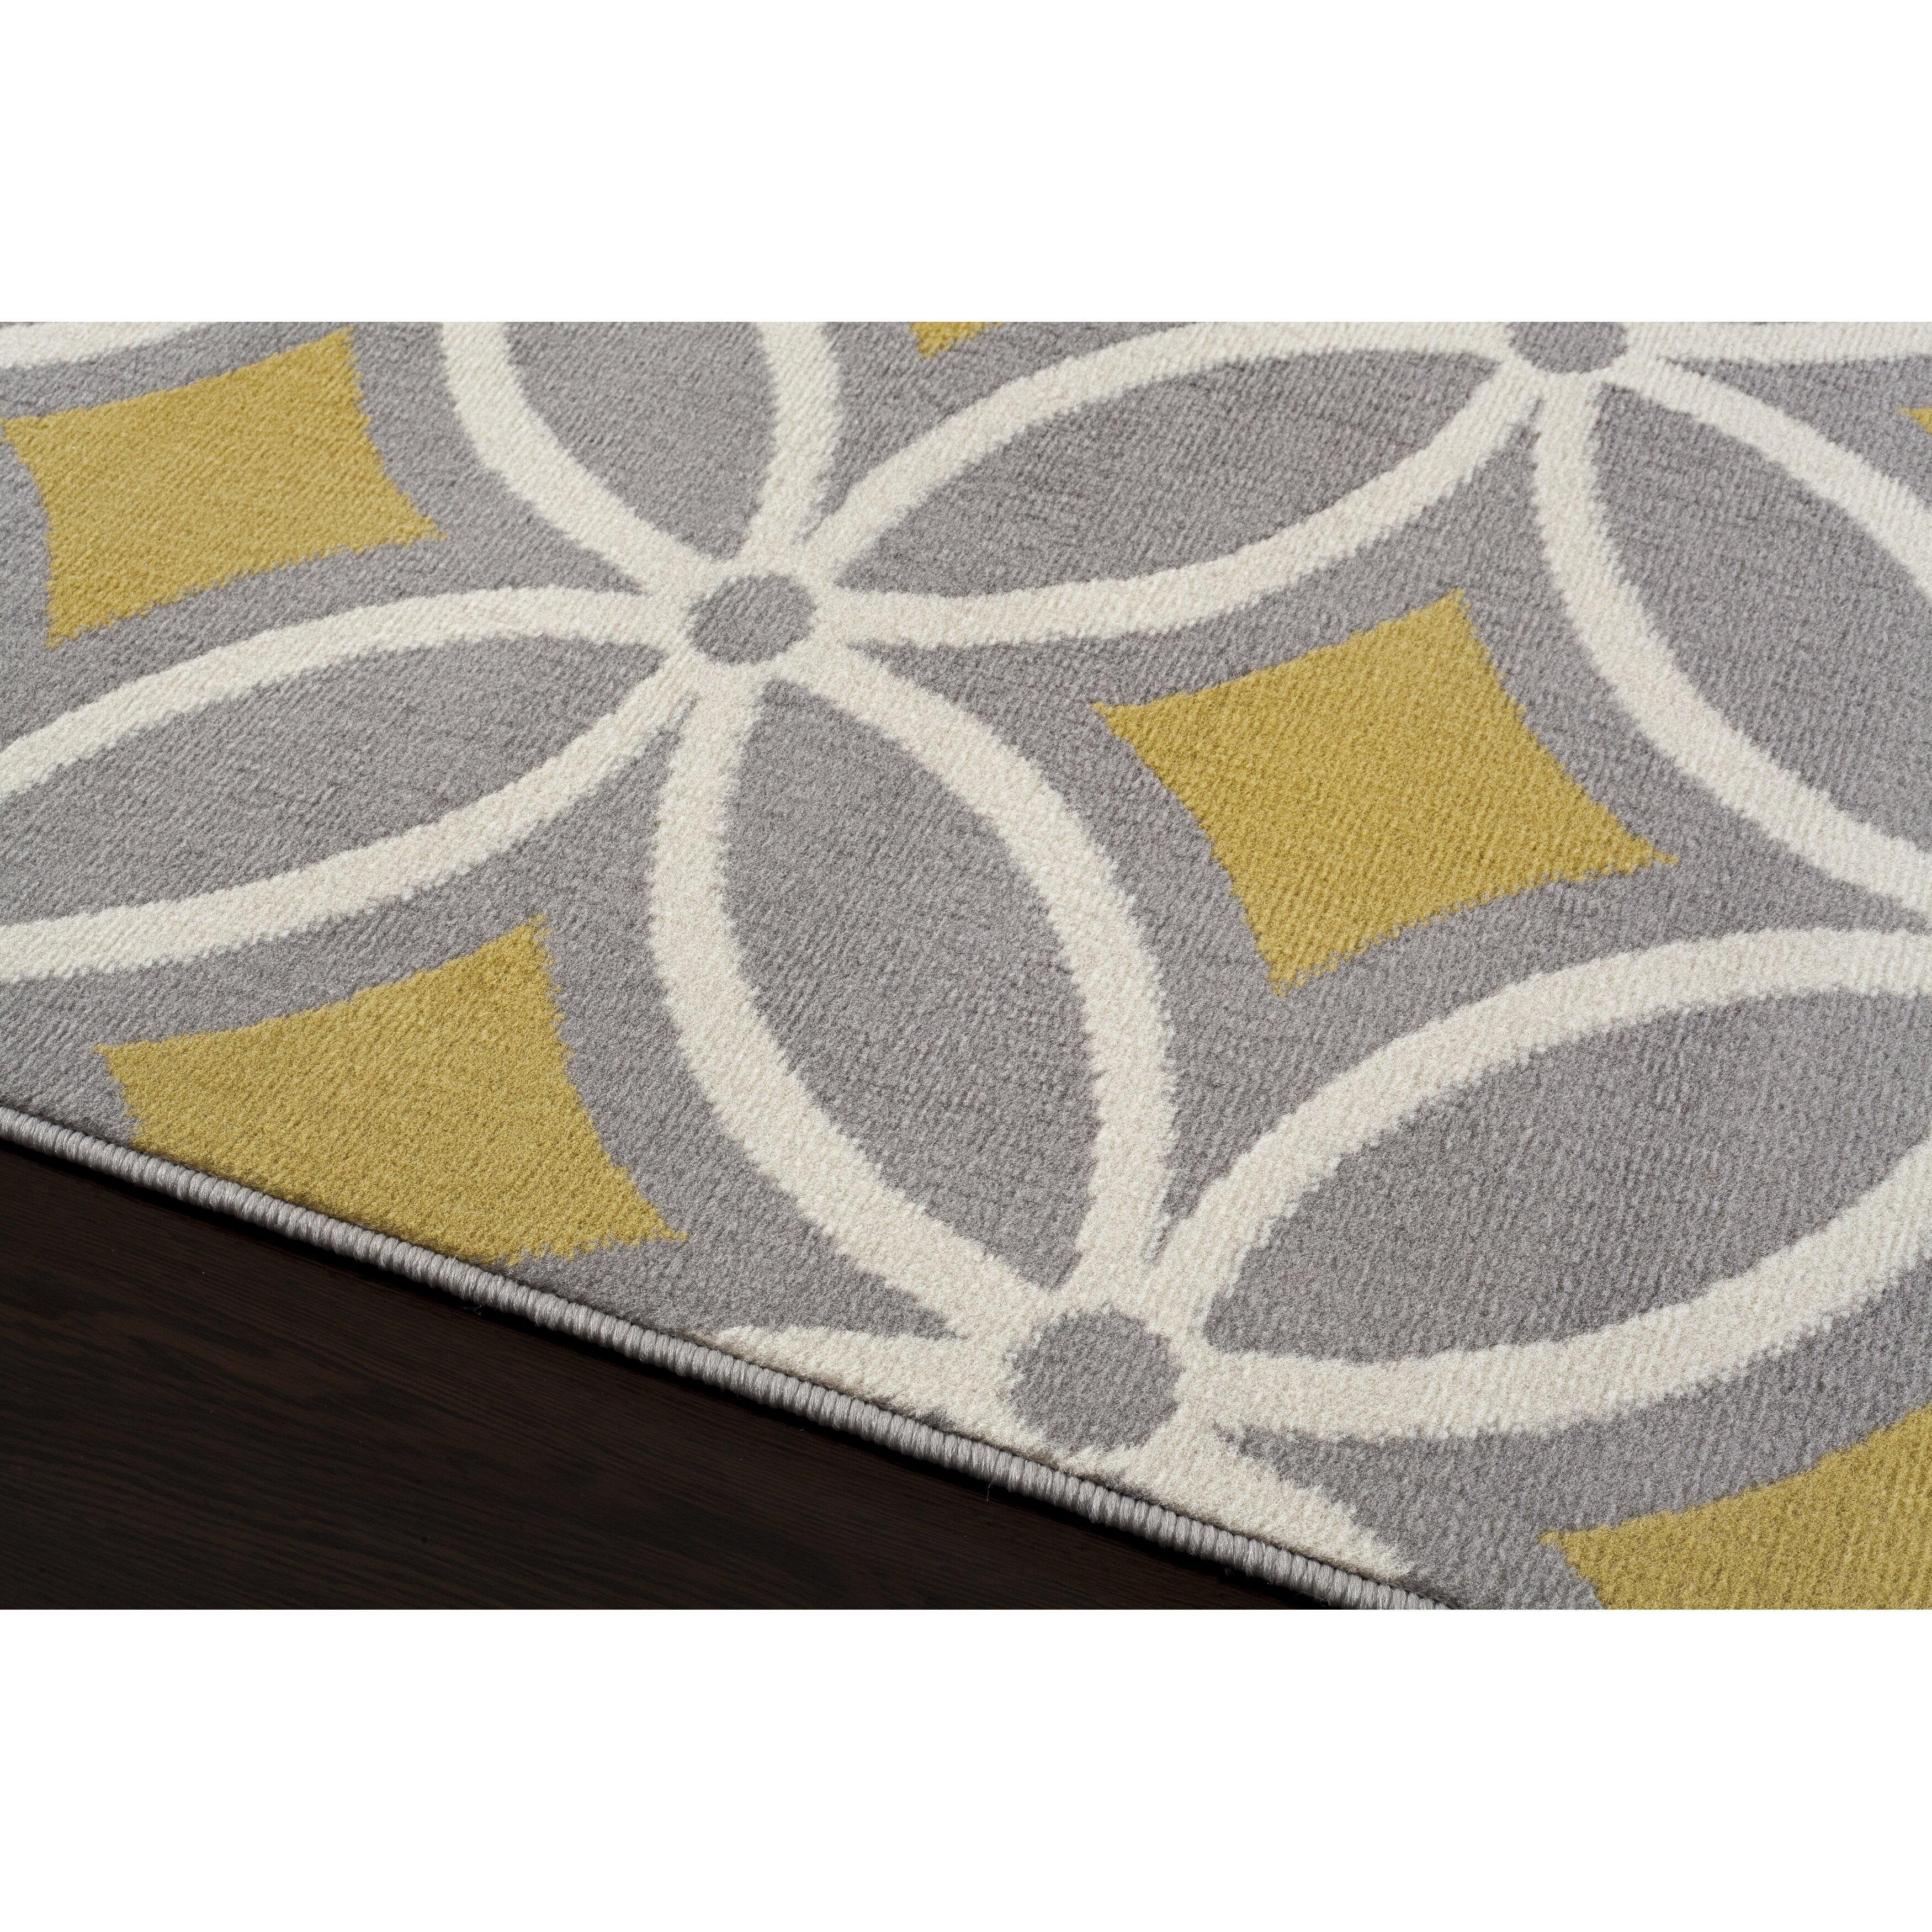 world rug gallery newport gray yellow area rug reviews wayfair. Black Bedroom Furniture Sets. Home Design Ideas